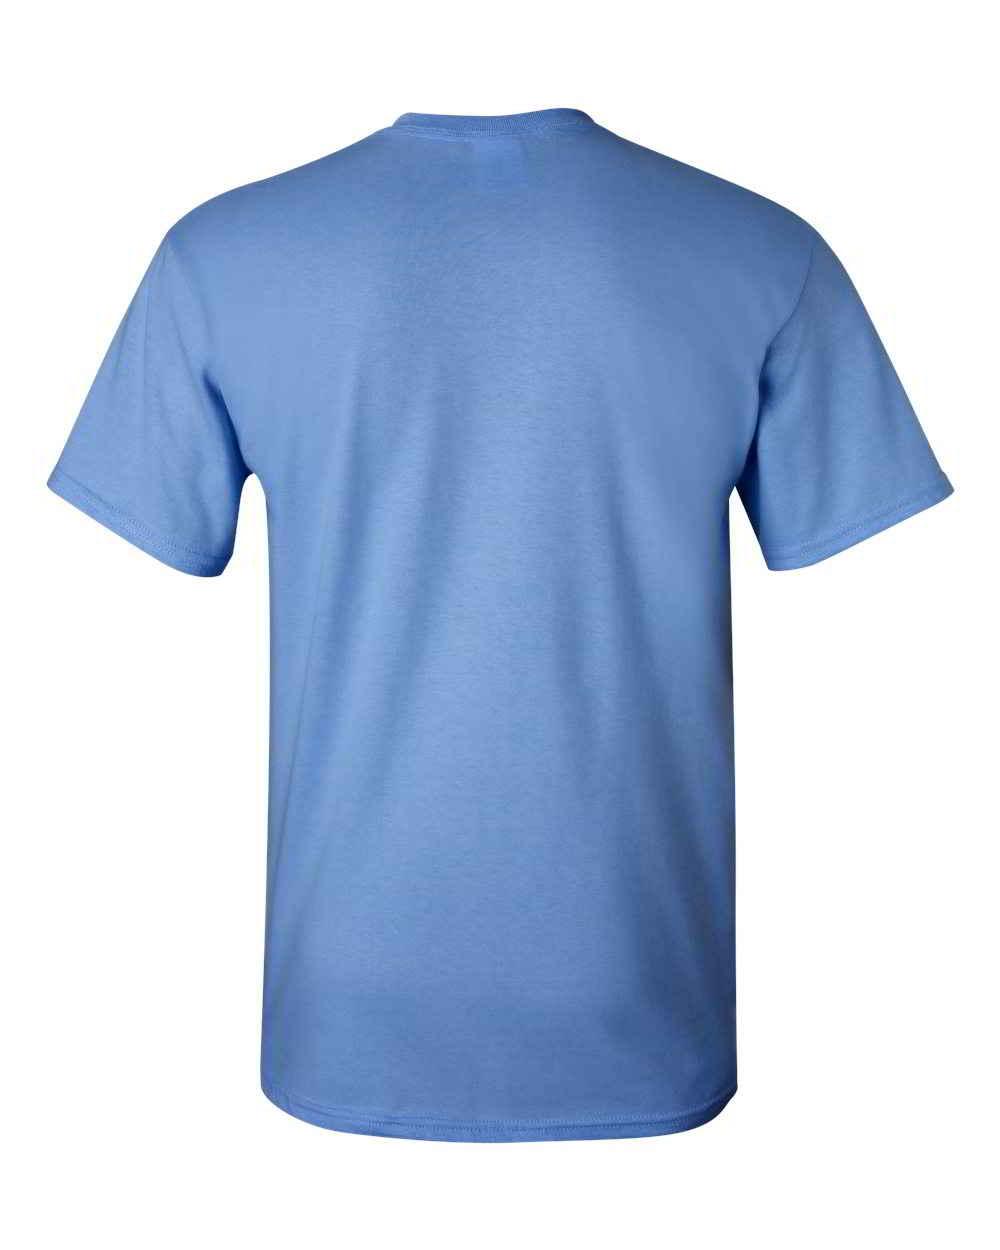 Gildan-Heavy-Cotton-Short-Sleeve-Mens-Blue-T-Shirts-5000 thumbnail 9